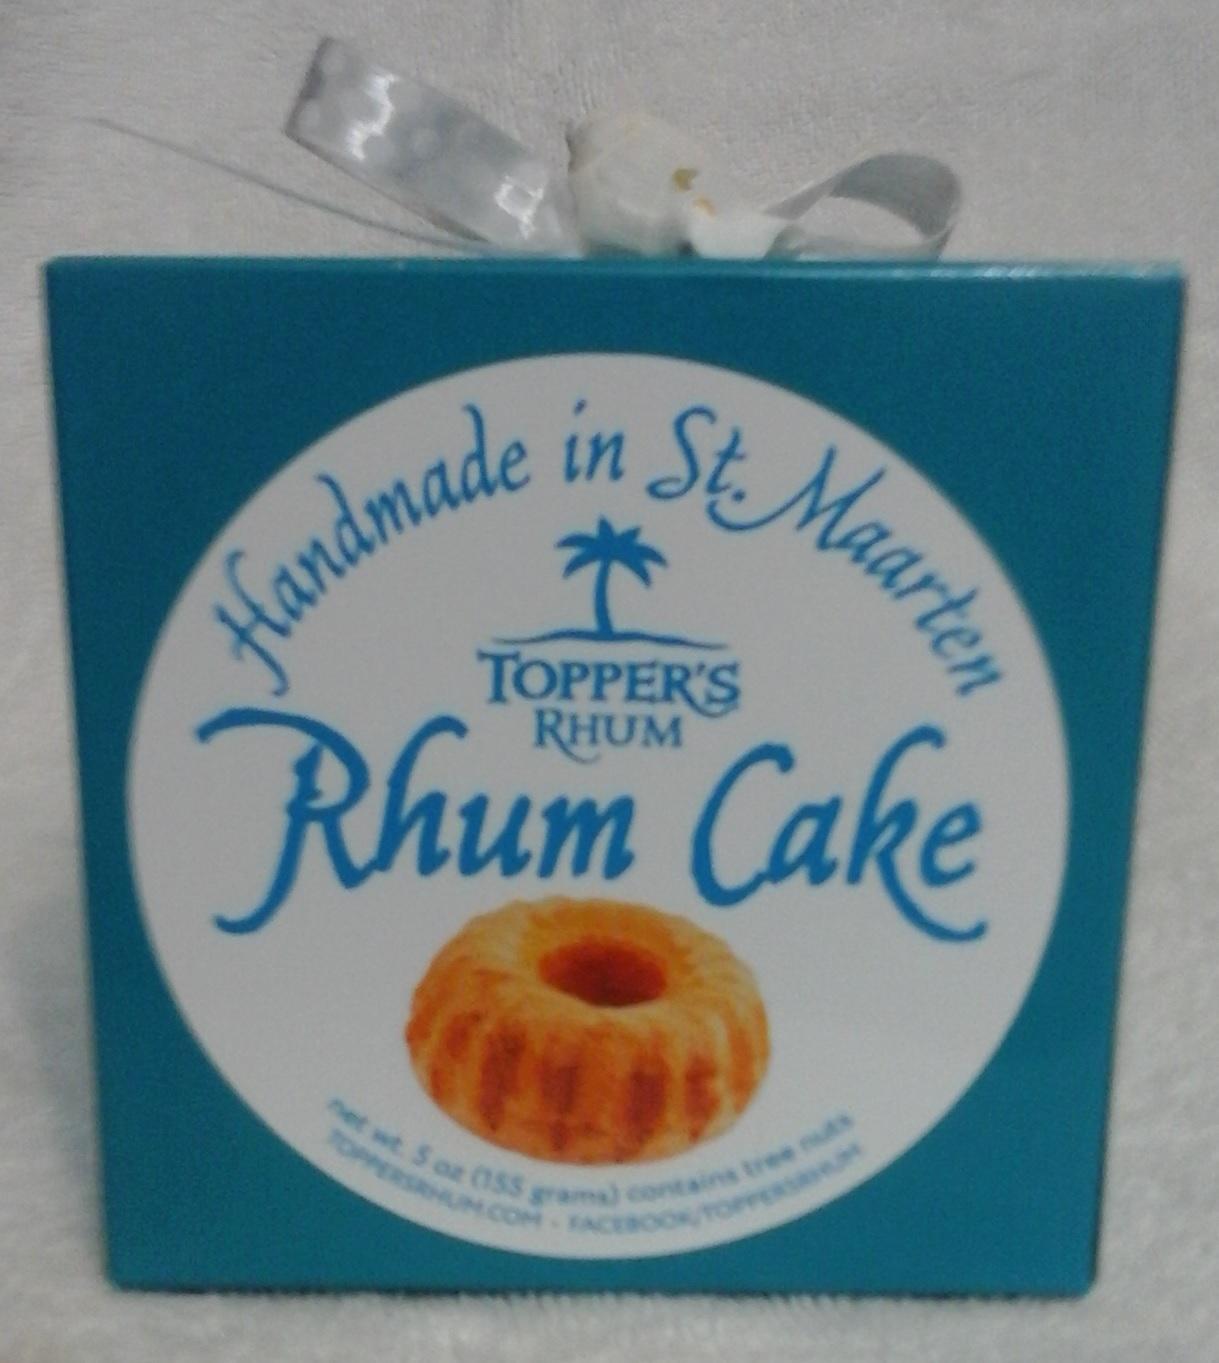 Toppers Rhum Cake Box